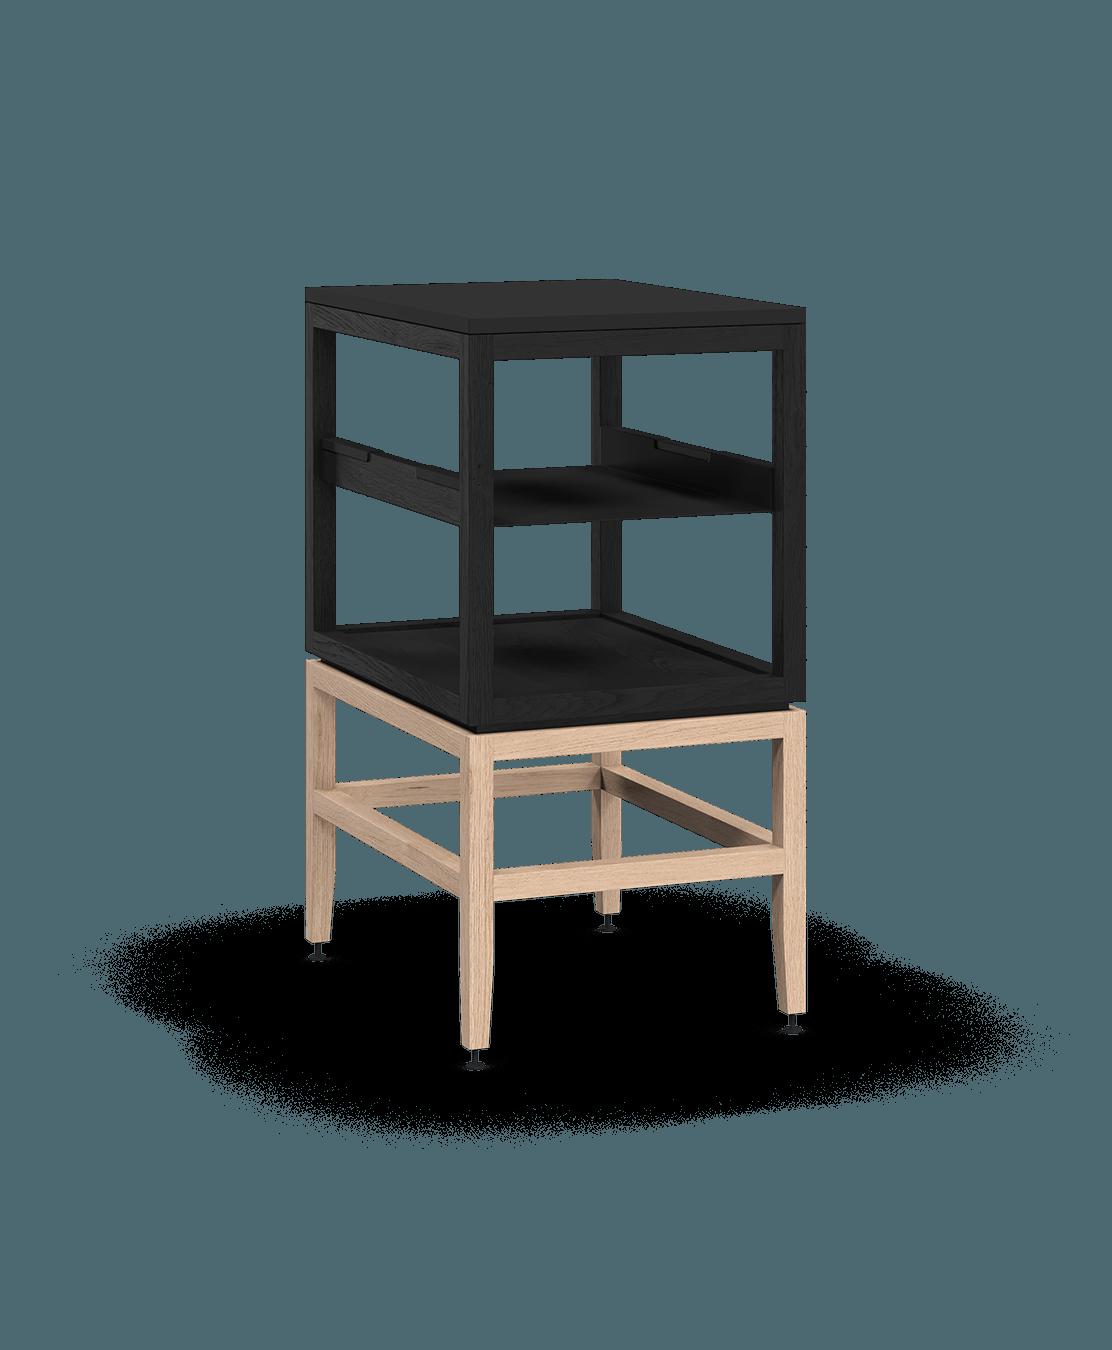 coquo volitare midnight black stained oak white oak solid wood modular cube 1 shelf storage open cabinet 18 inch C2-N-1824-0012-BK-NA